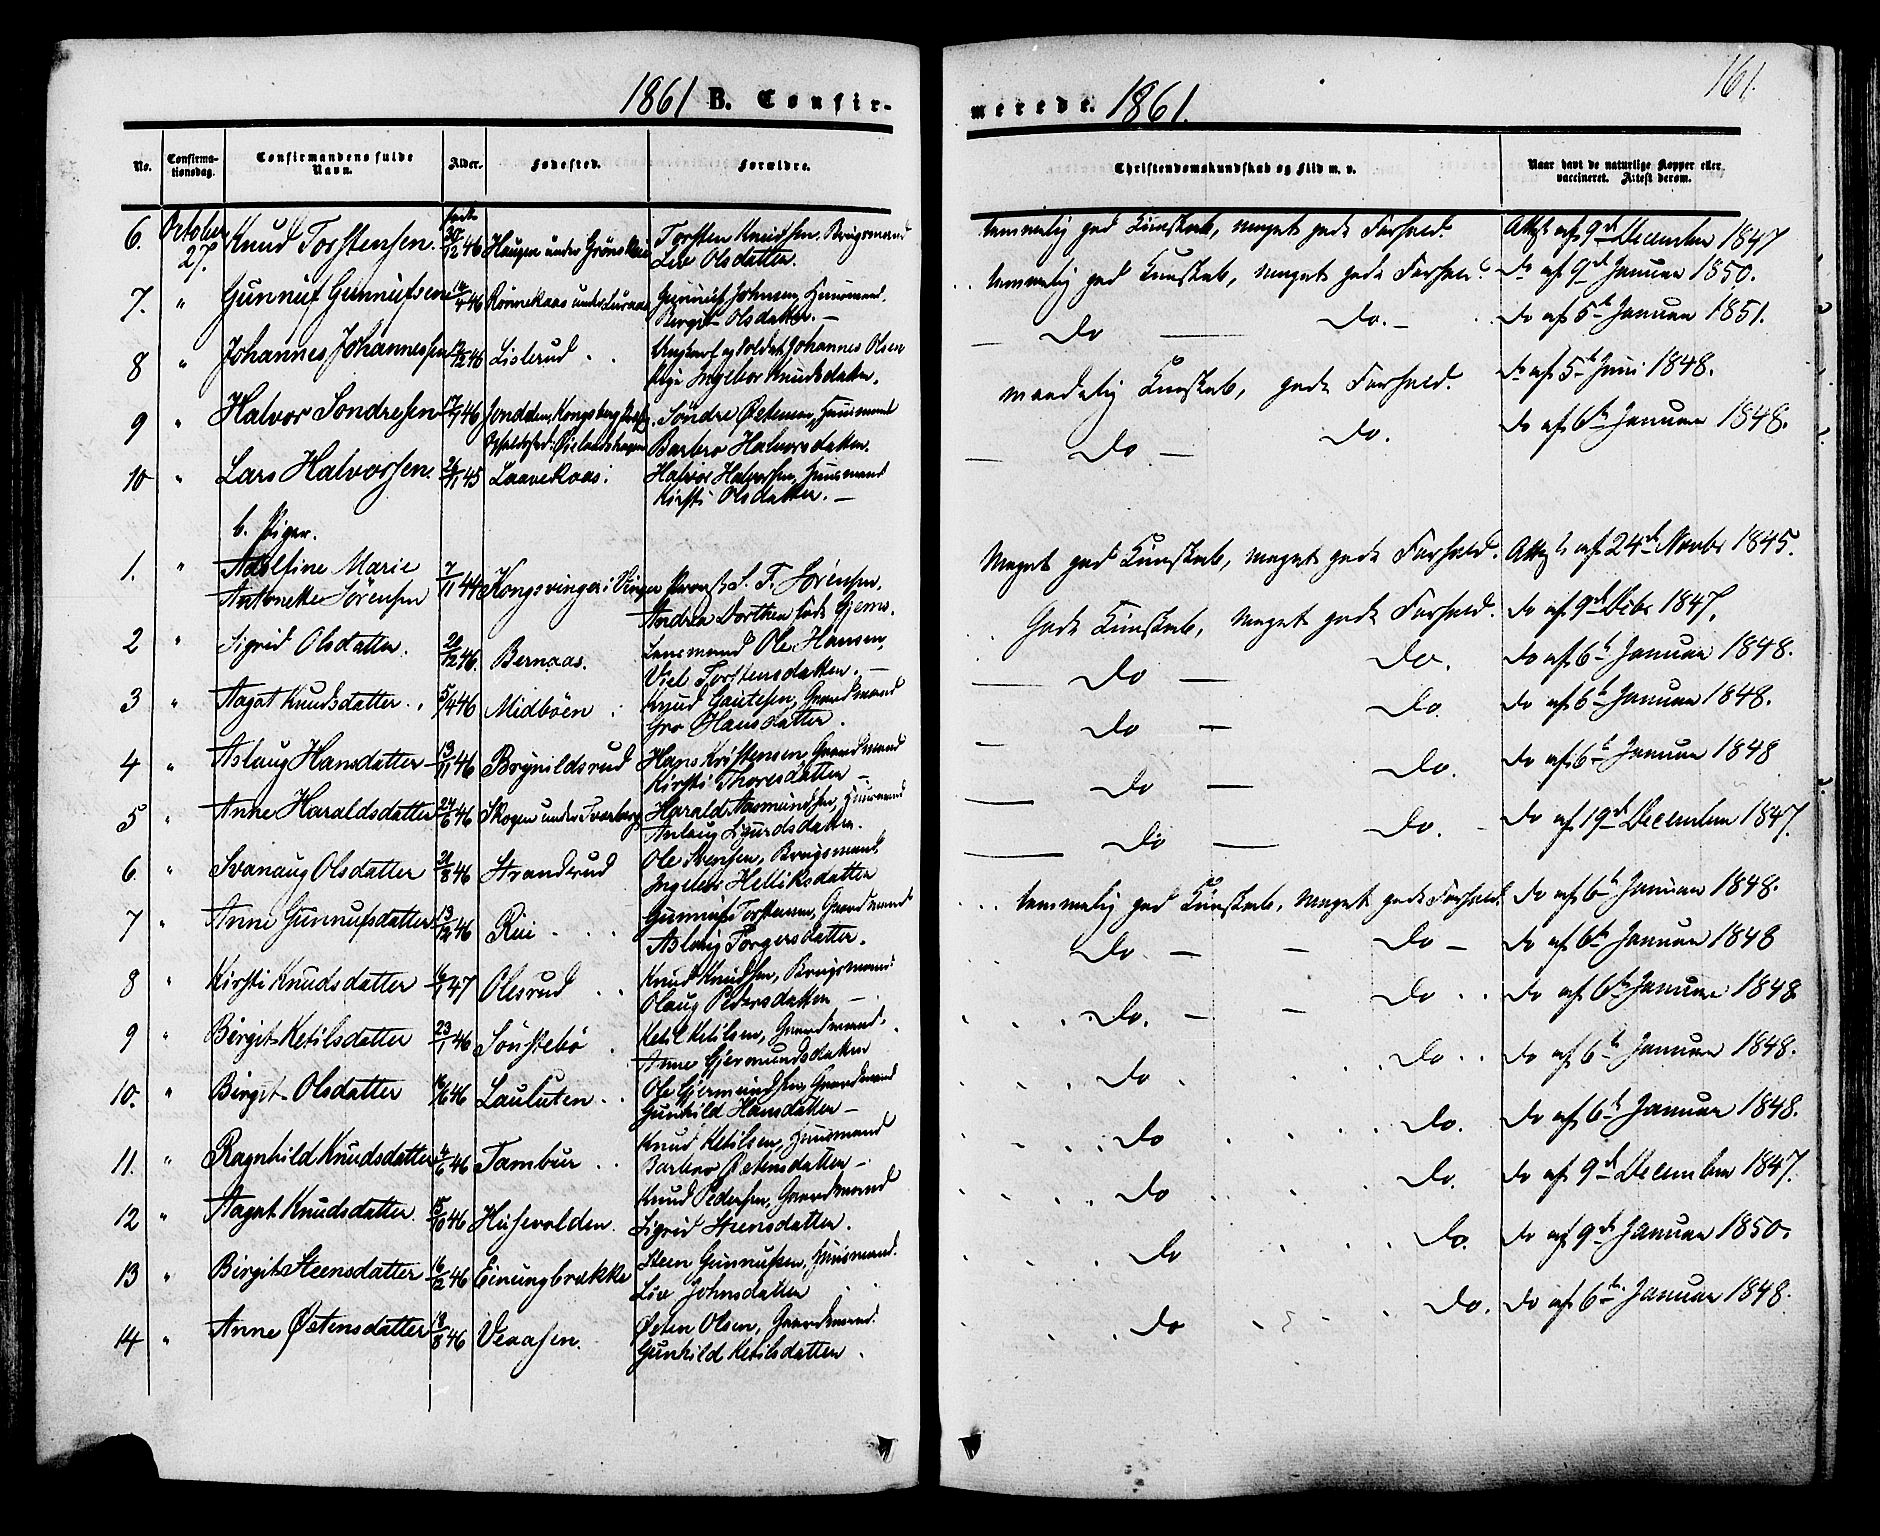 SAKO, Tinn kirkebøker, F/Fa/L0006: Ministerialbok nr. I 6, 1857-1878, s. 161